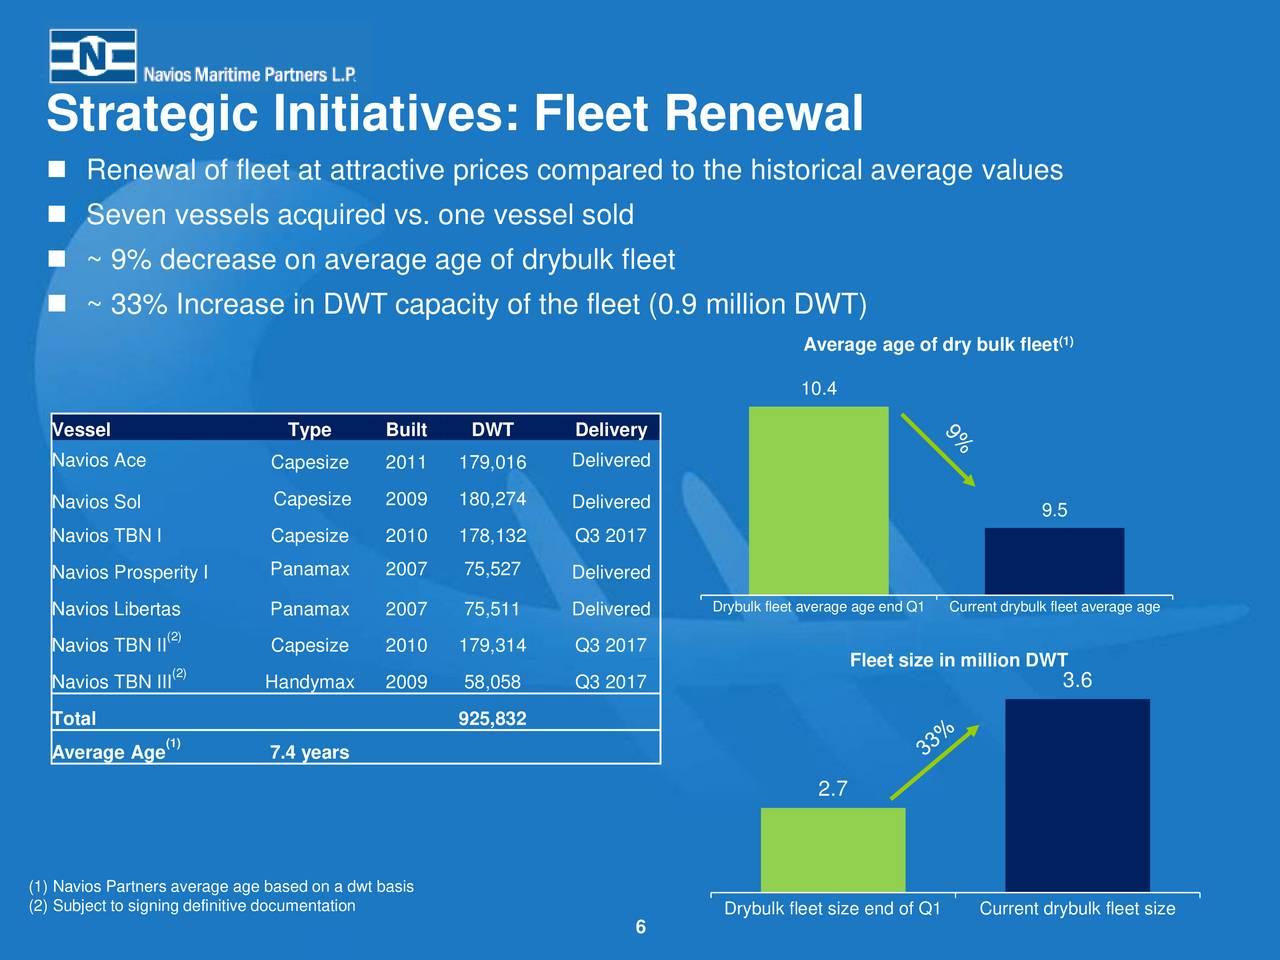 drybulk shipping strategic analysis Marit pol mgmt, june 2008 vol 35, no 3, 237-251 an analysis of freight rate volatility in dry bulk shipping markets lu jingy, peter b marlowz and wang huiy.